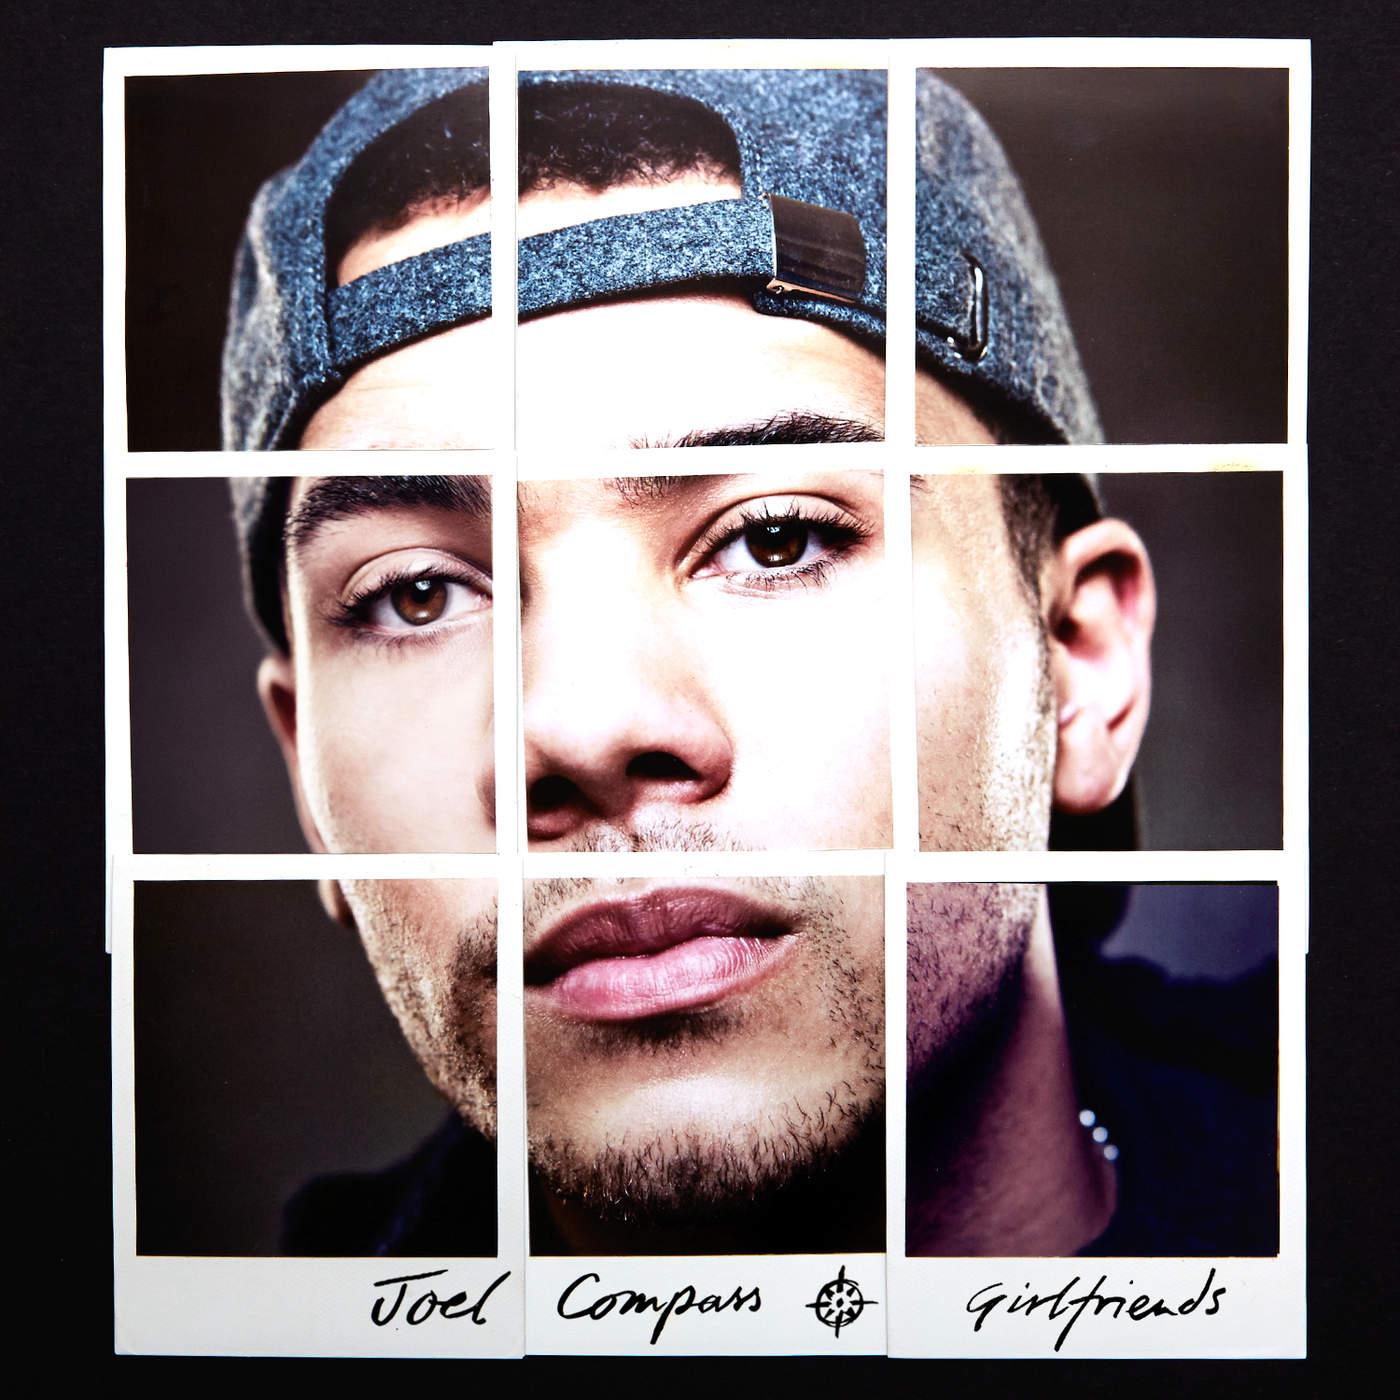 Joel Compass - Girlfriends - Single Cover